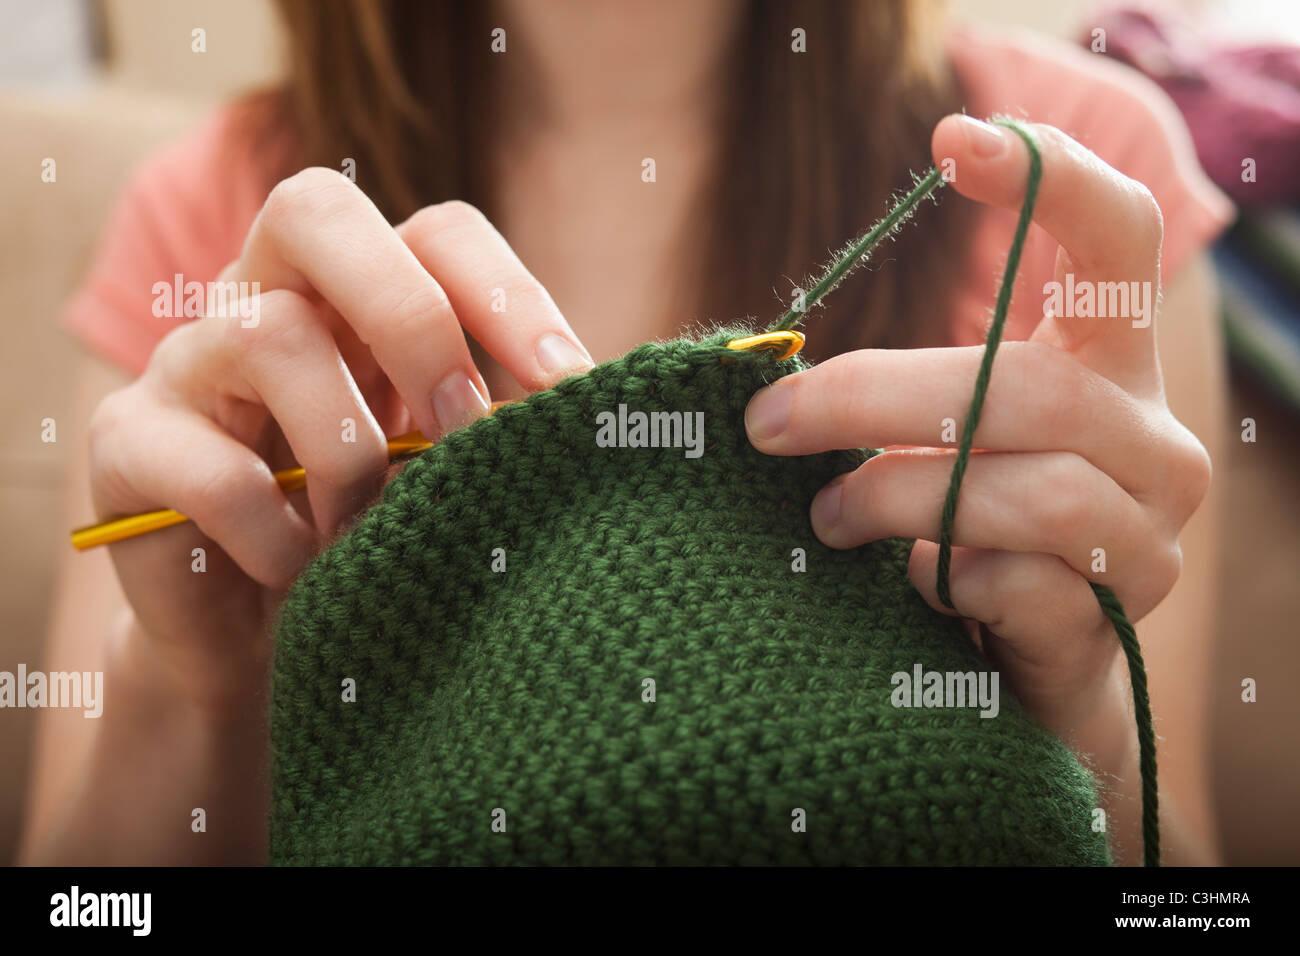 Jeune femme knitting woolly hat Photo Stock